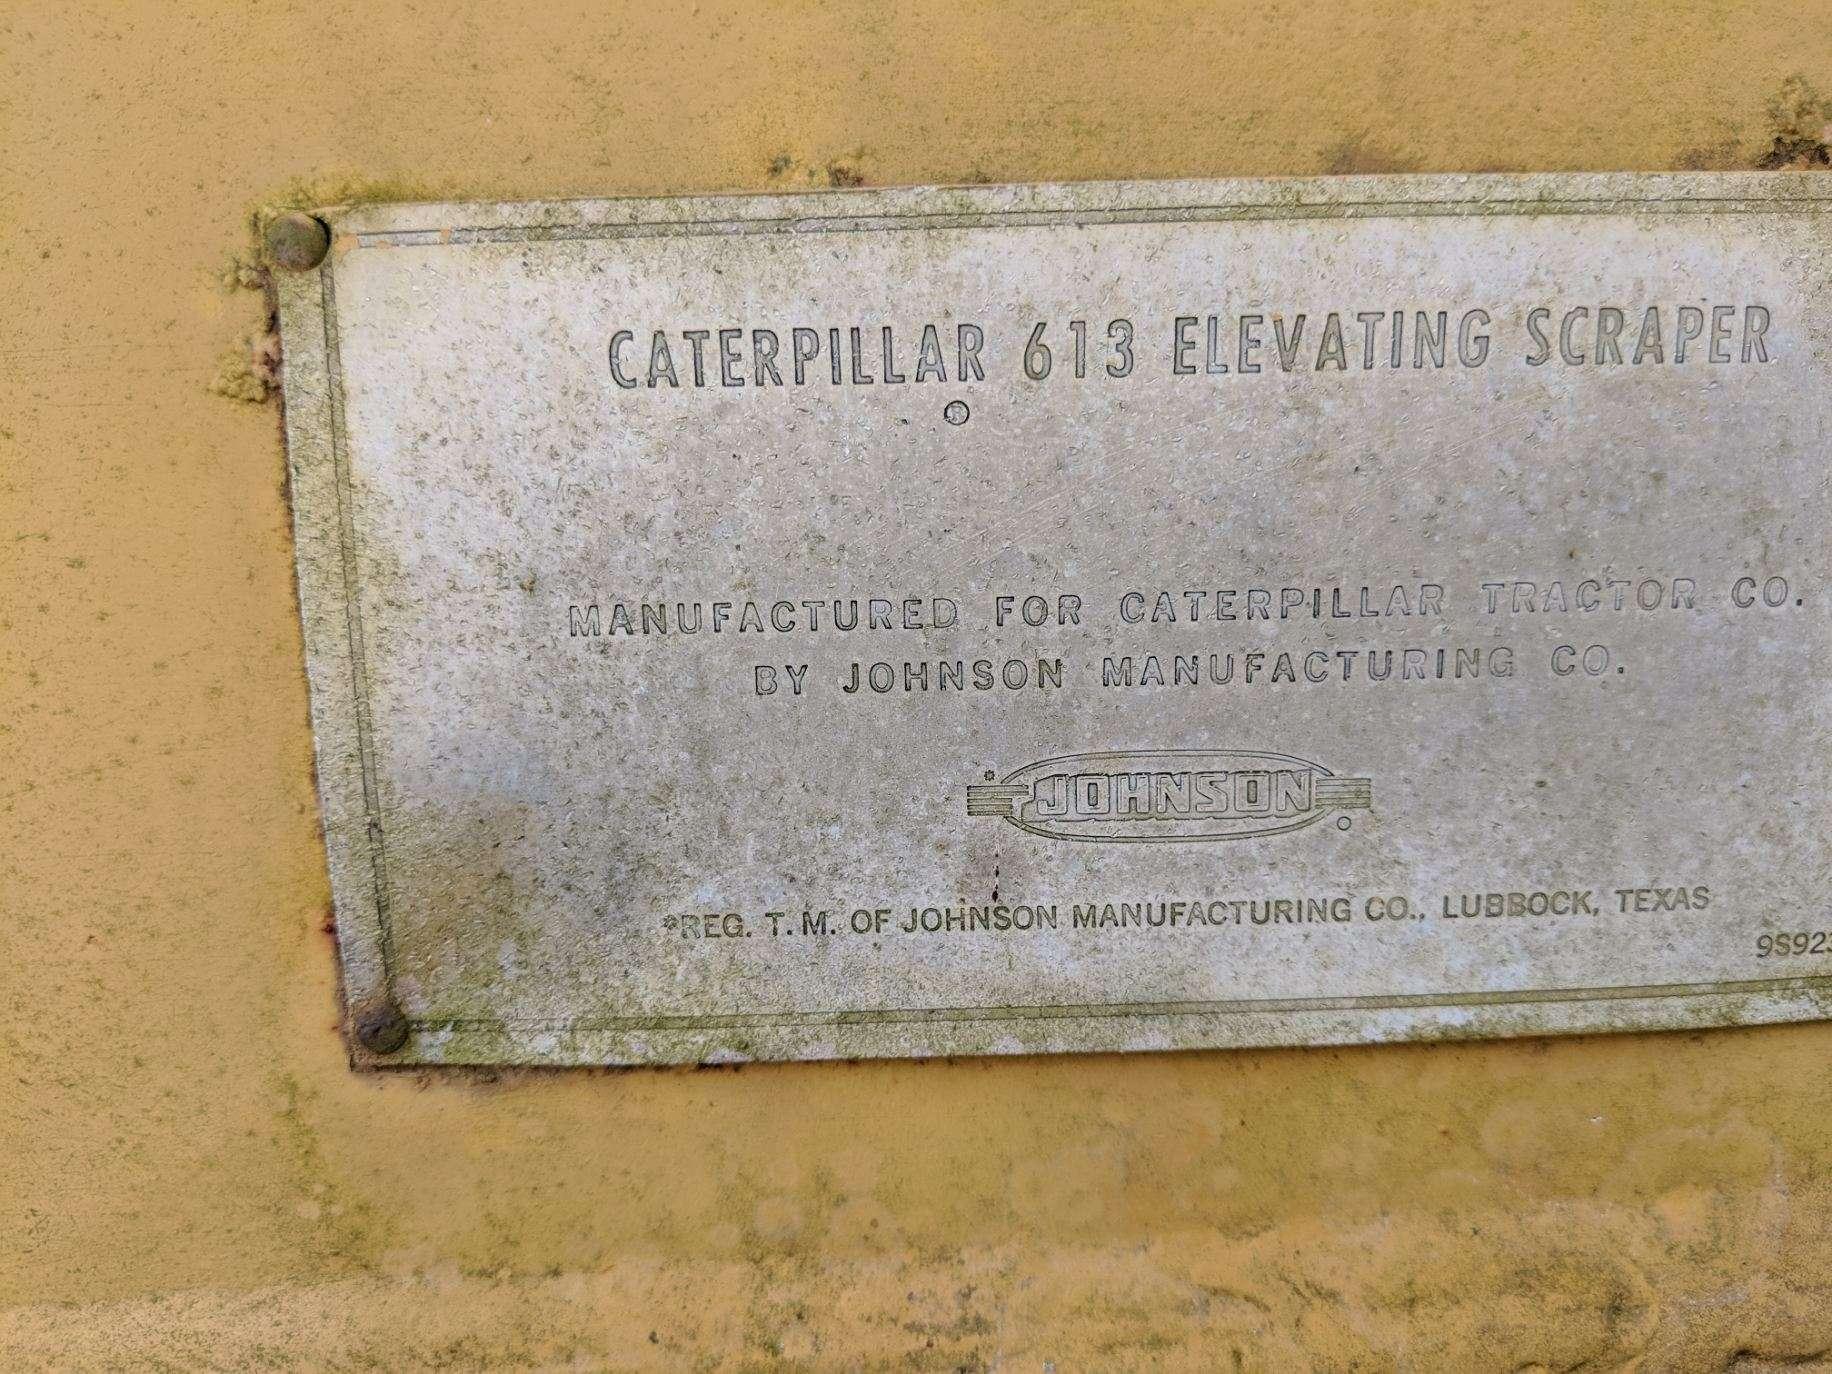 Caterpillar 613 Scraper